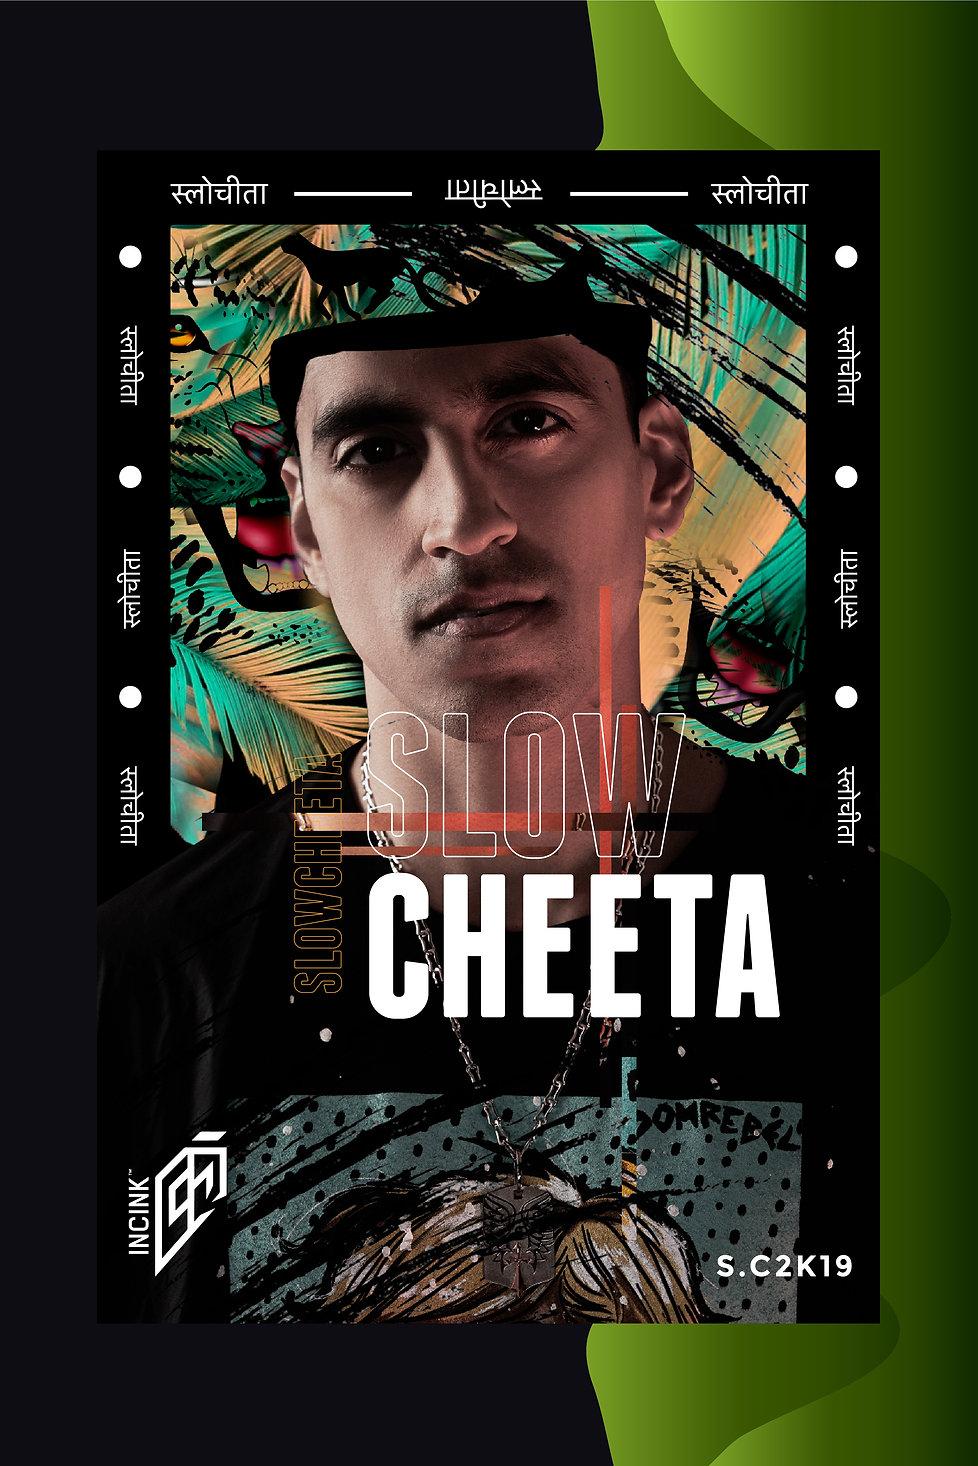 Slowcheeta Posters-08.jpg